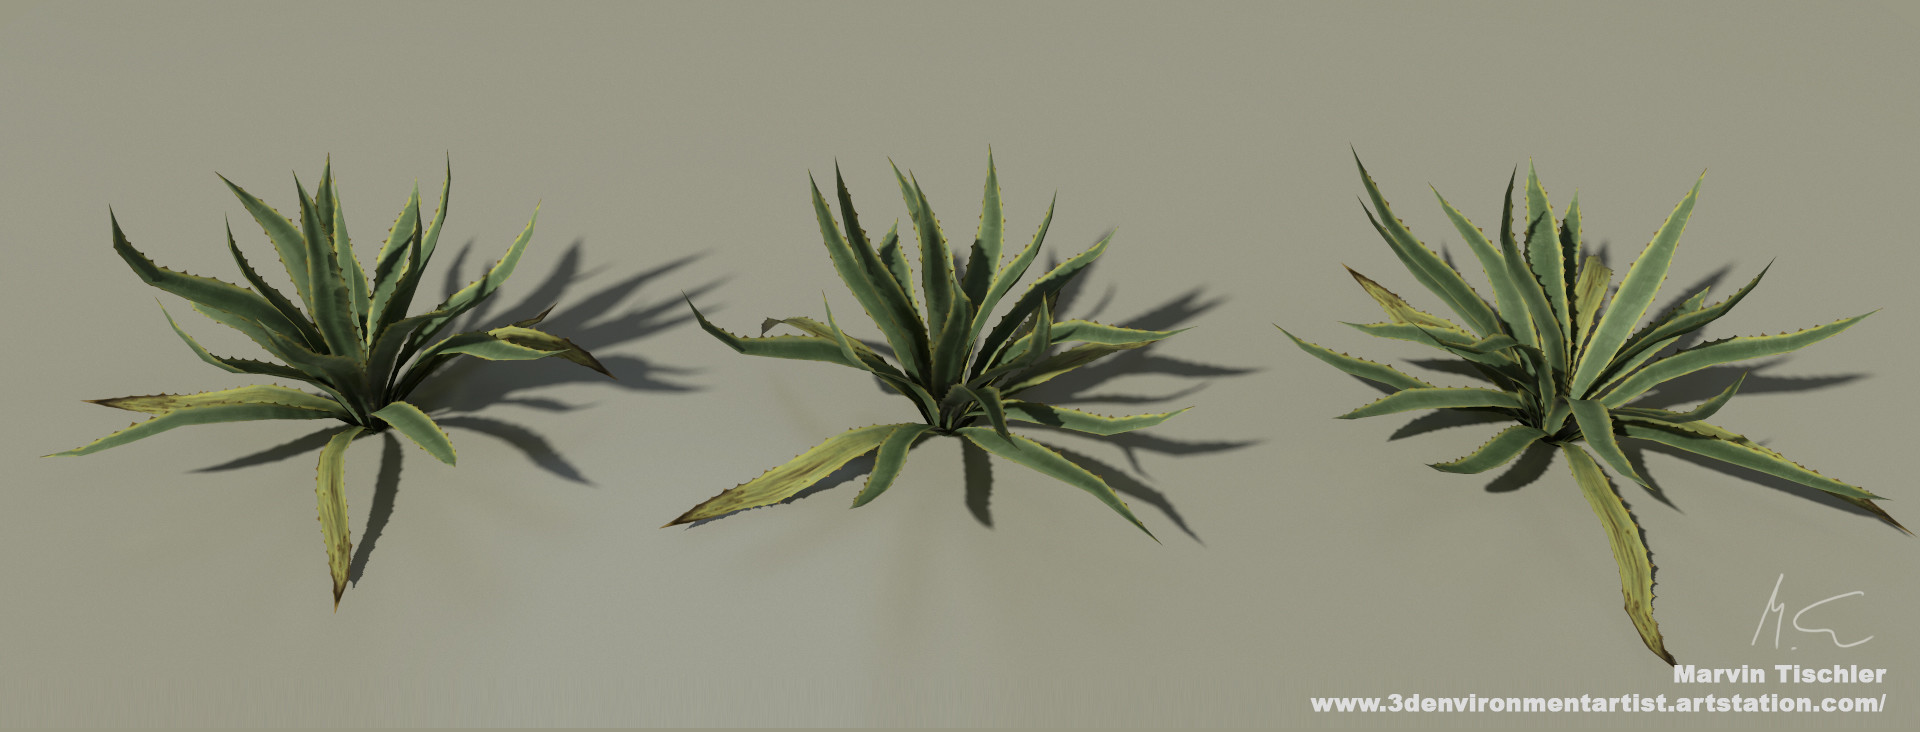 Marvin tischler plants 001 g